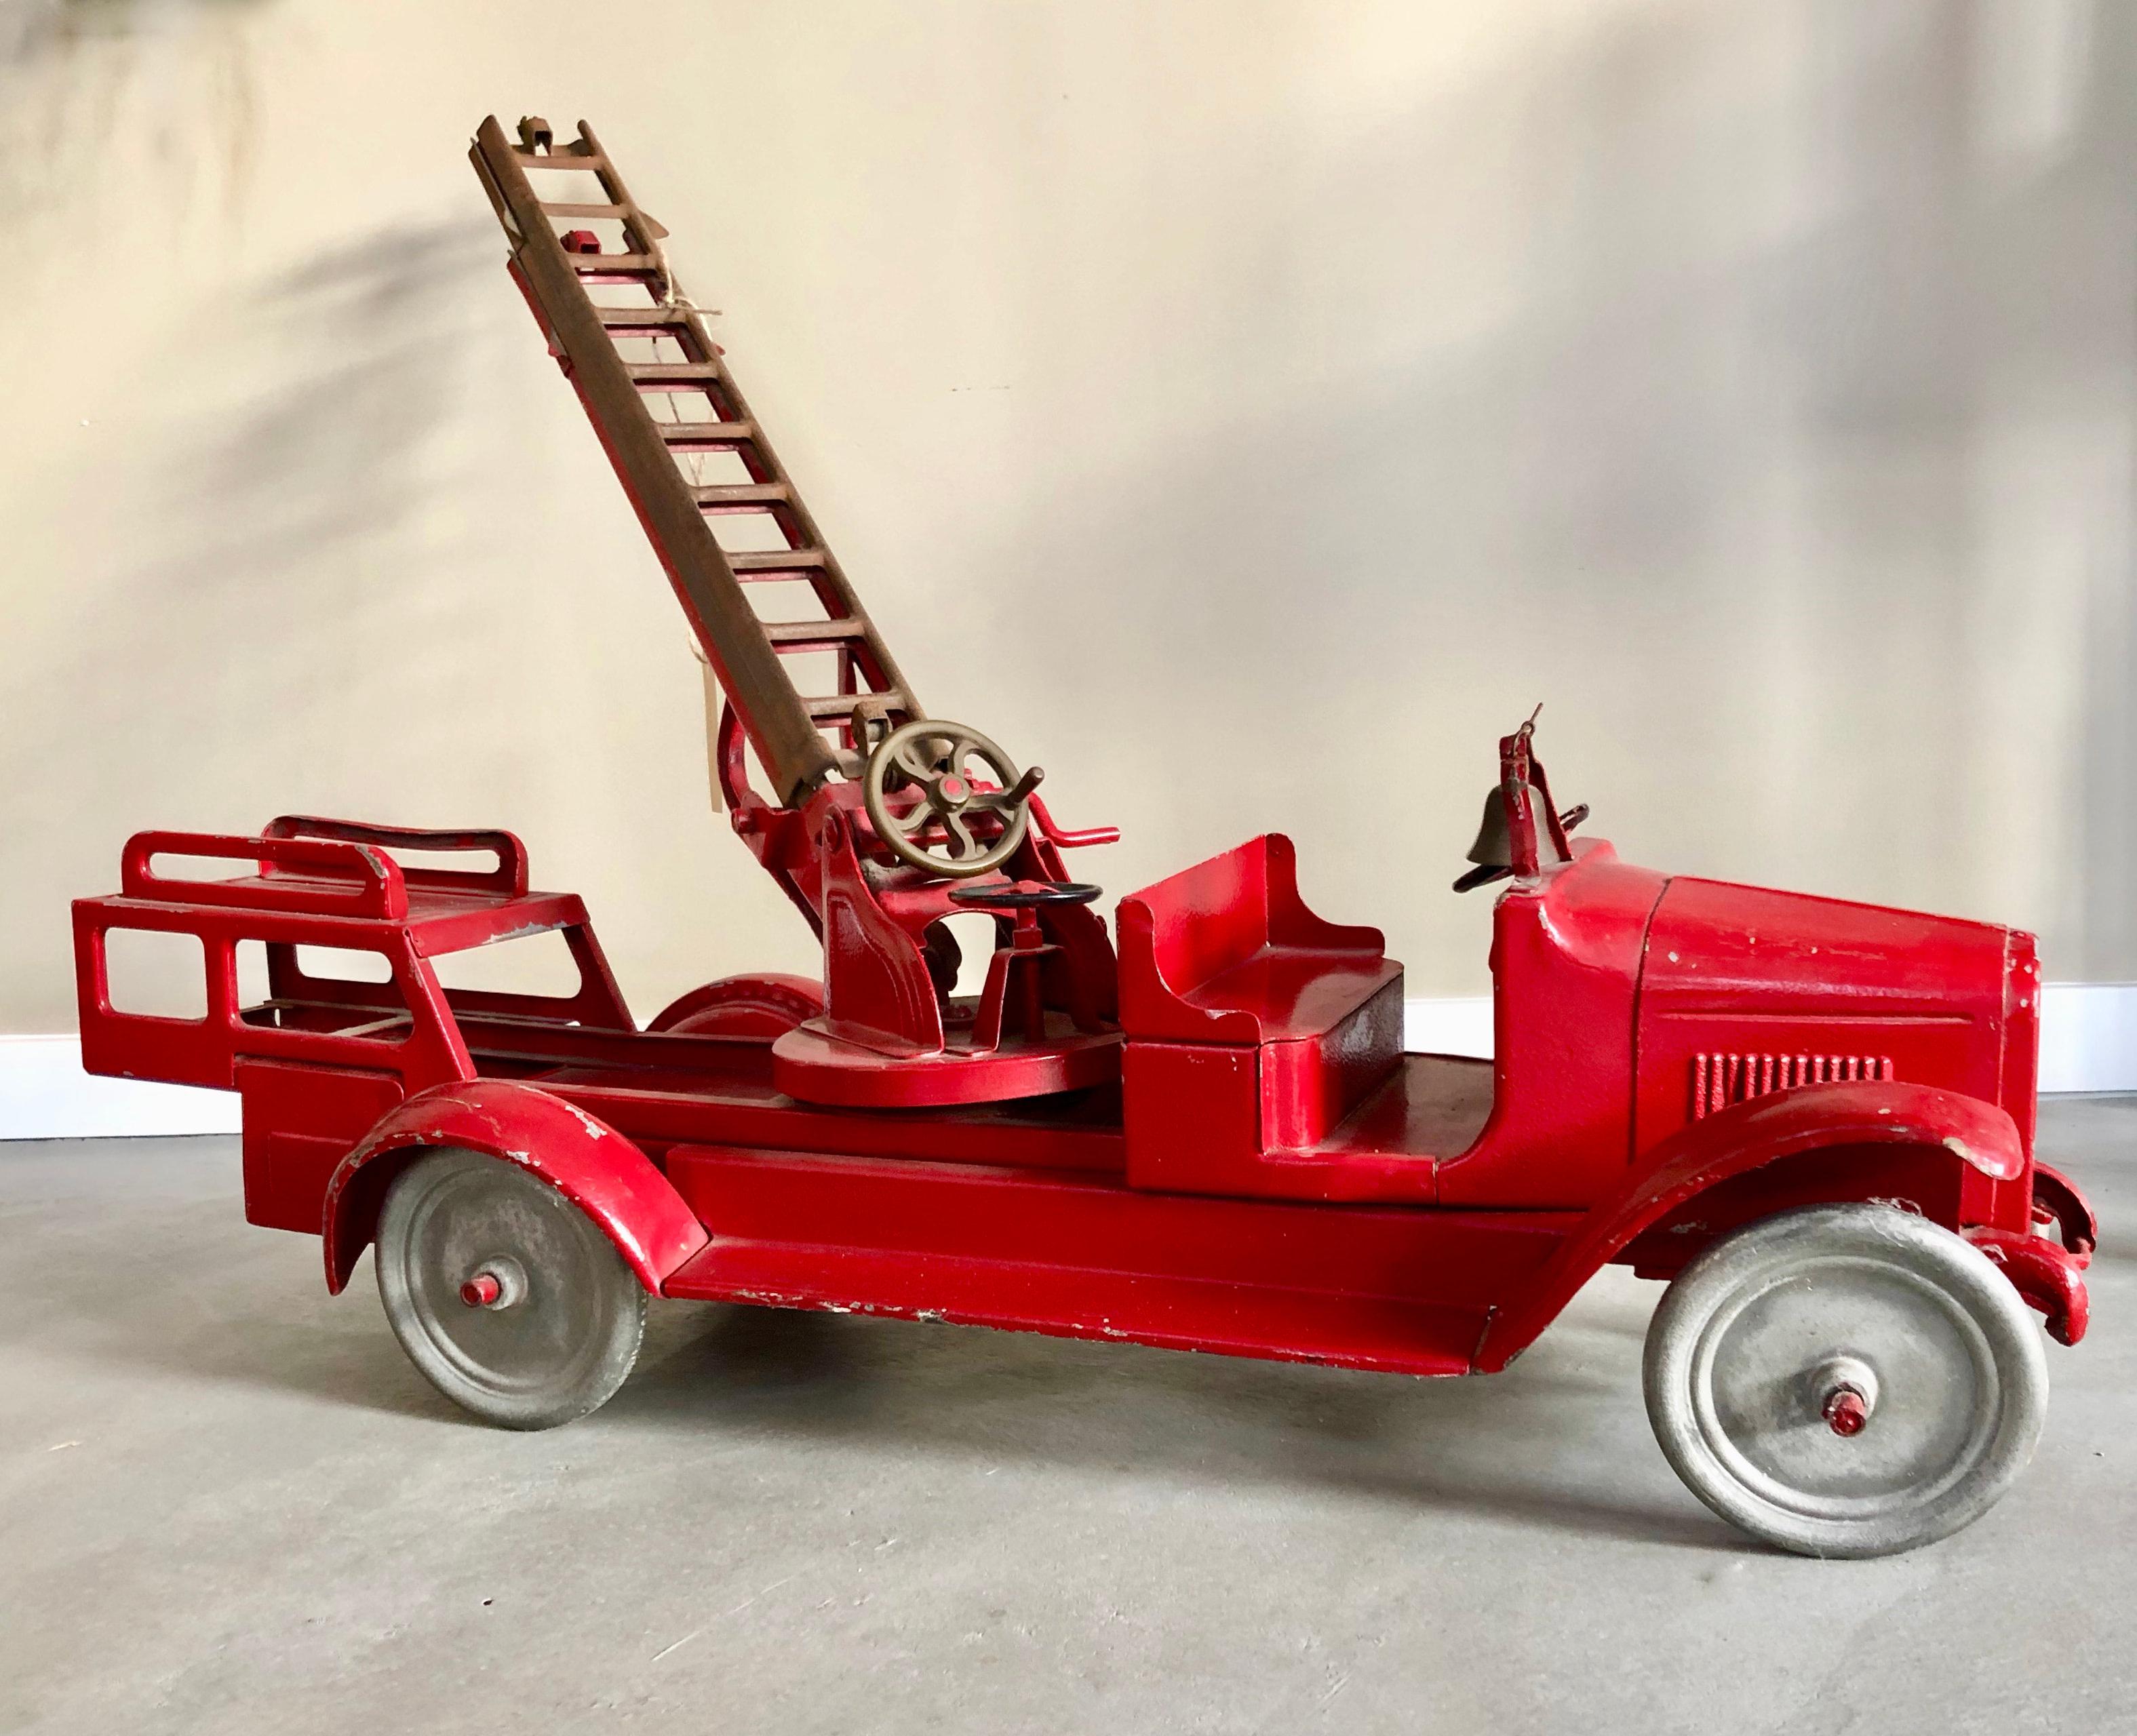 Buddy L Firetruck USA, 1920s